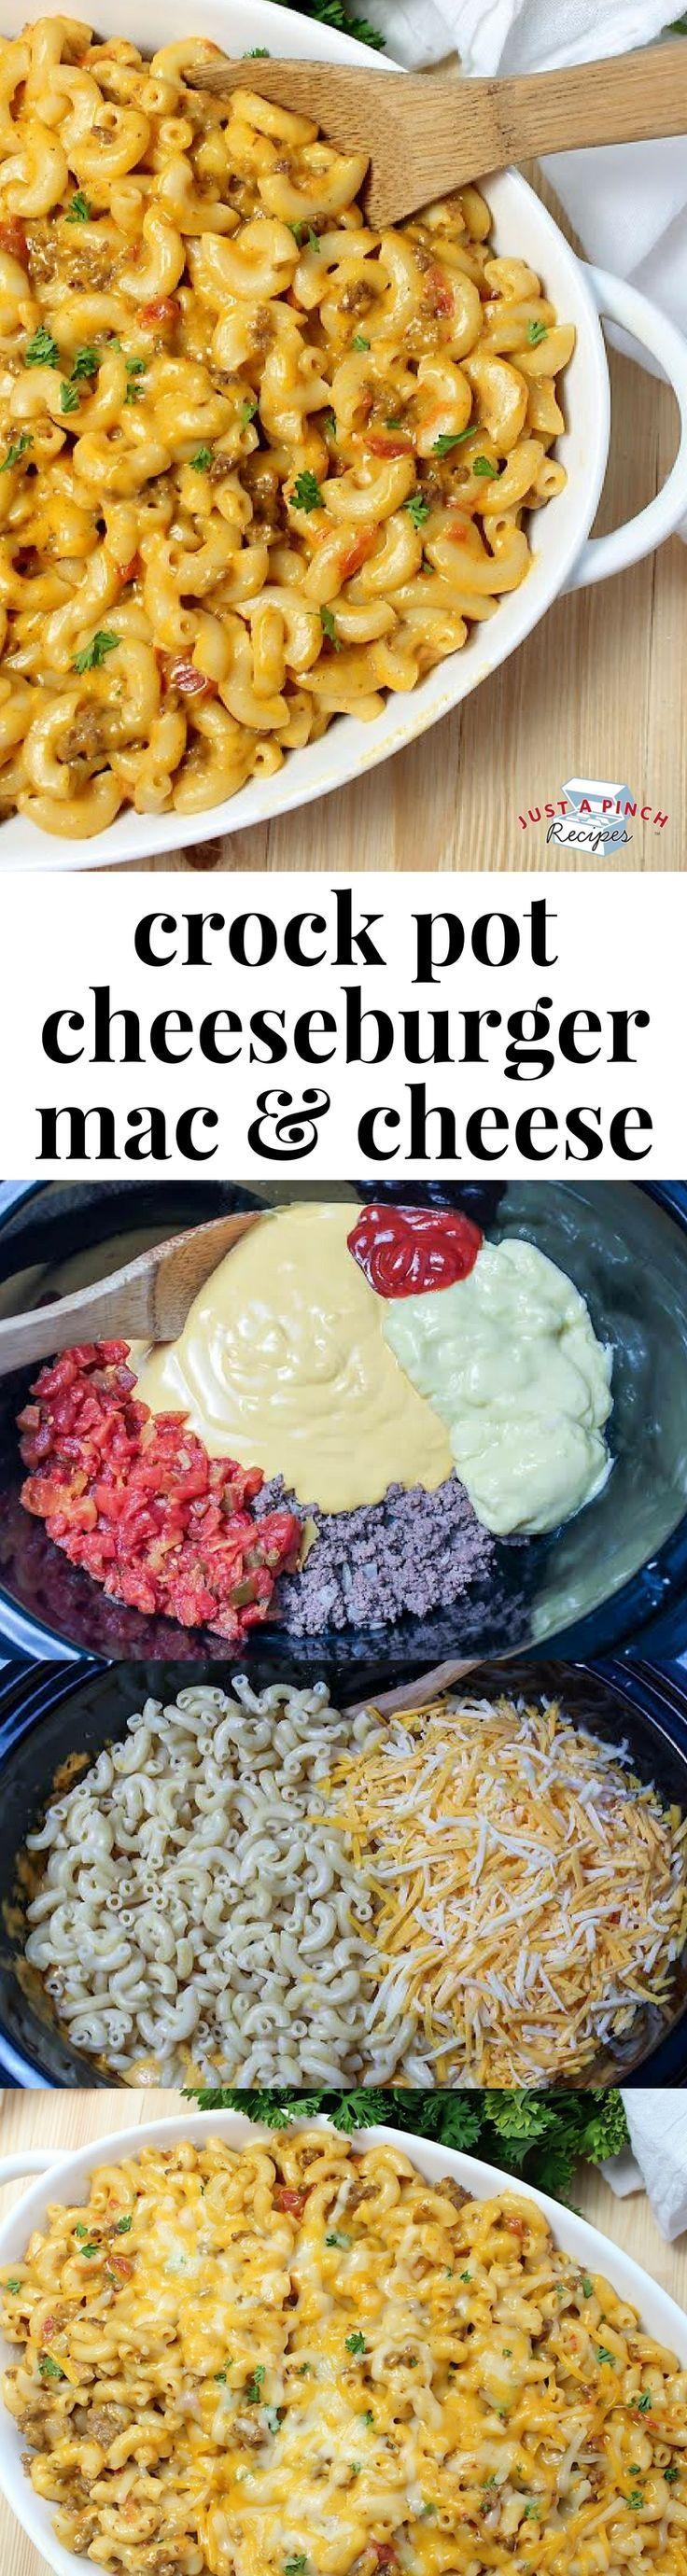 Crock Pot Cheeseburger Macaroni and Cheese